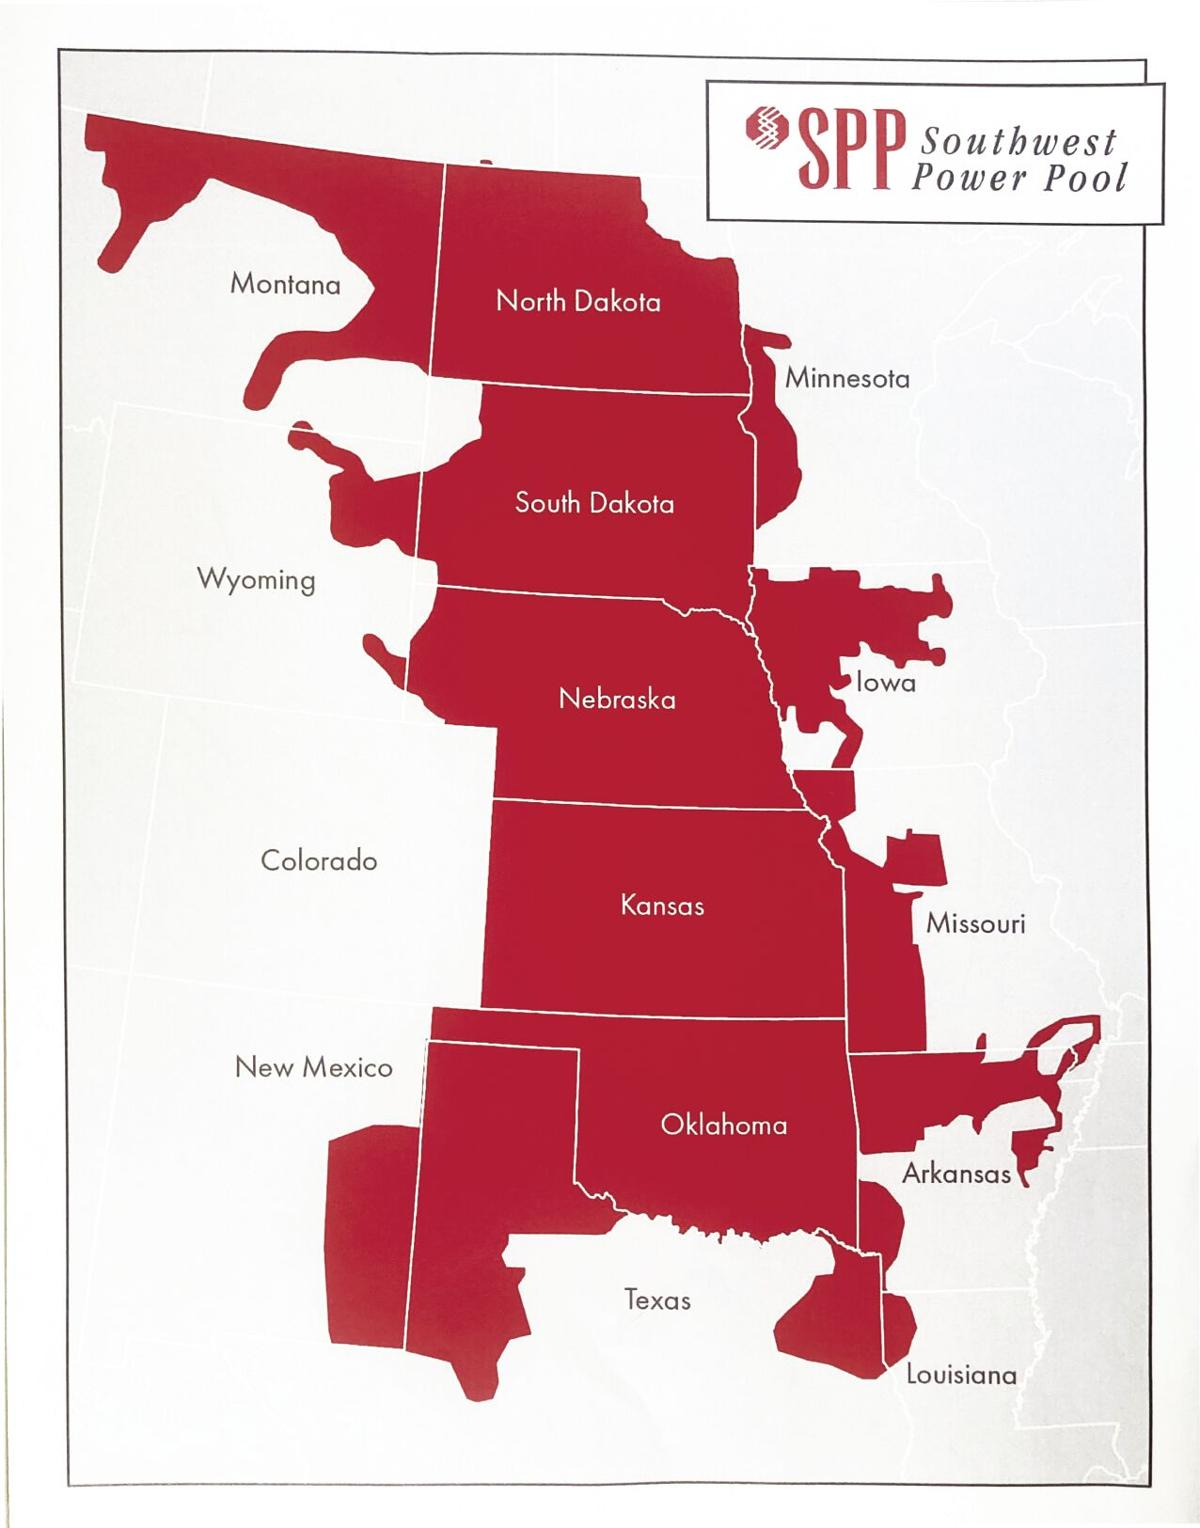 Southwest Power Pool map